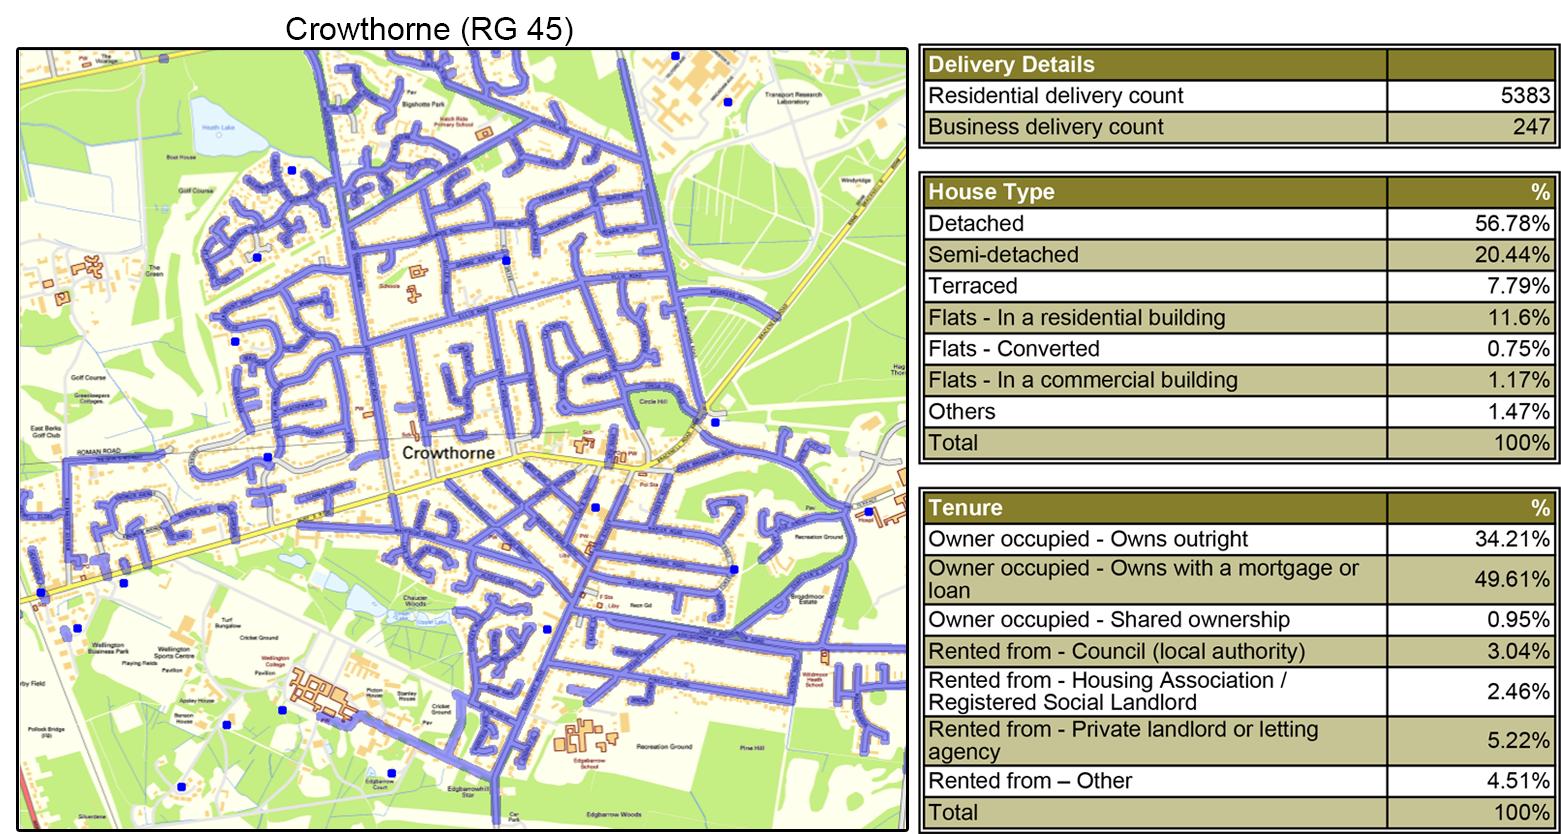 Geoplan Image - Leaflet Distribution in Berkshire